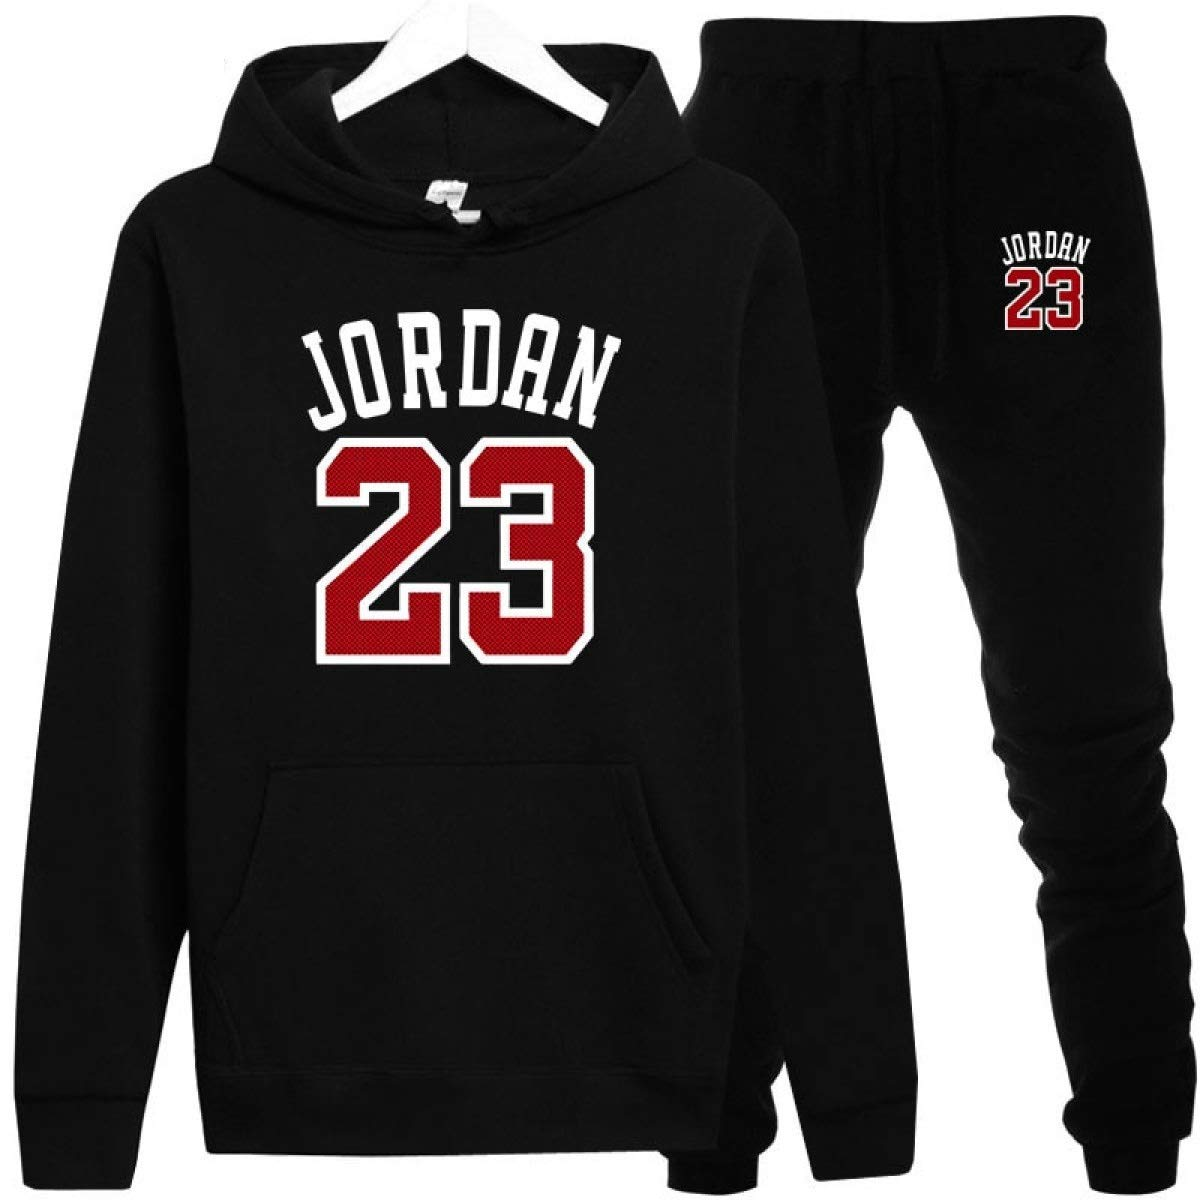 Amazon.com: Jordan 23 Men Sportswear Men Hoodies Pullover Mens Sweatshirts Clothing: Clothing